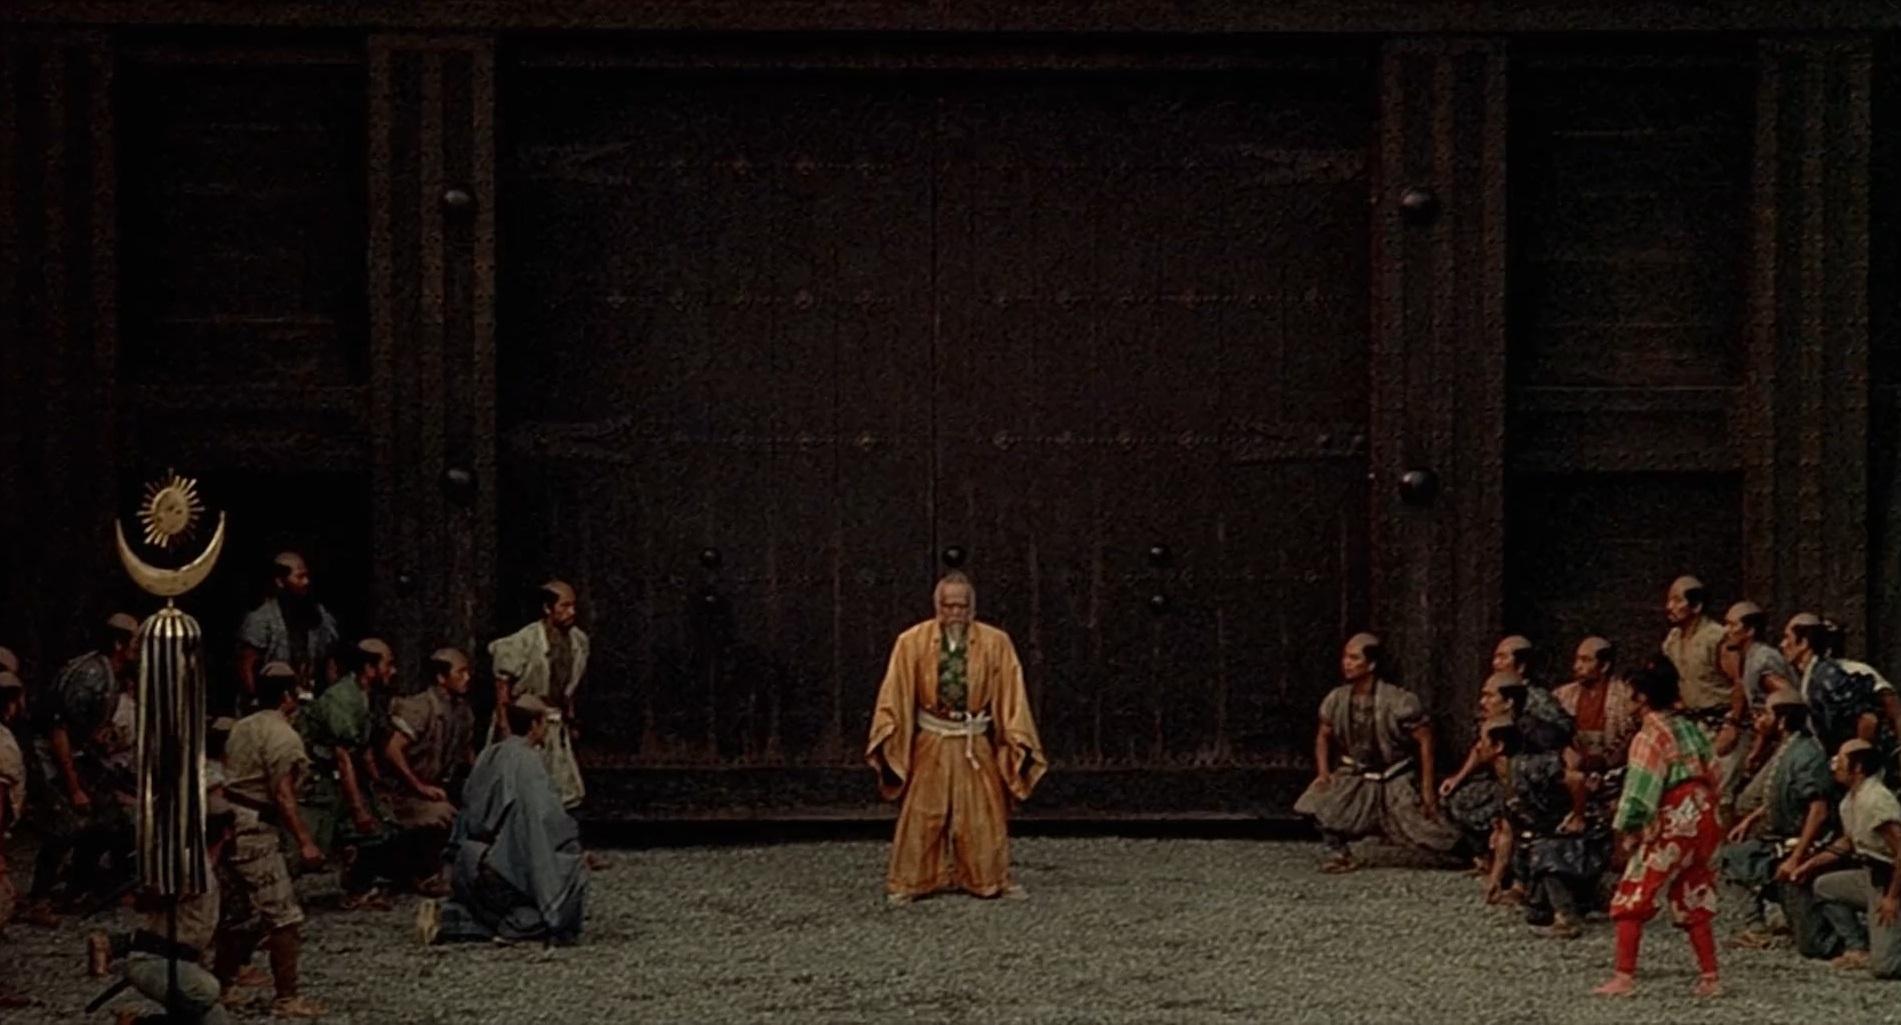 Kazuo Katô, Tatsuya Nakadai, and Pîtâ in Ran (1985)